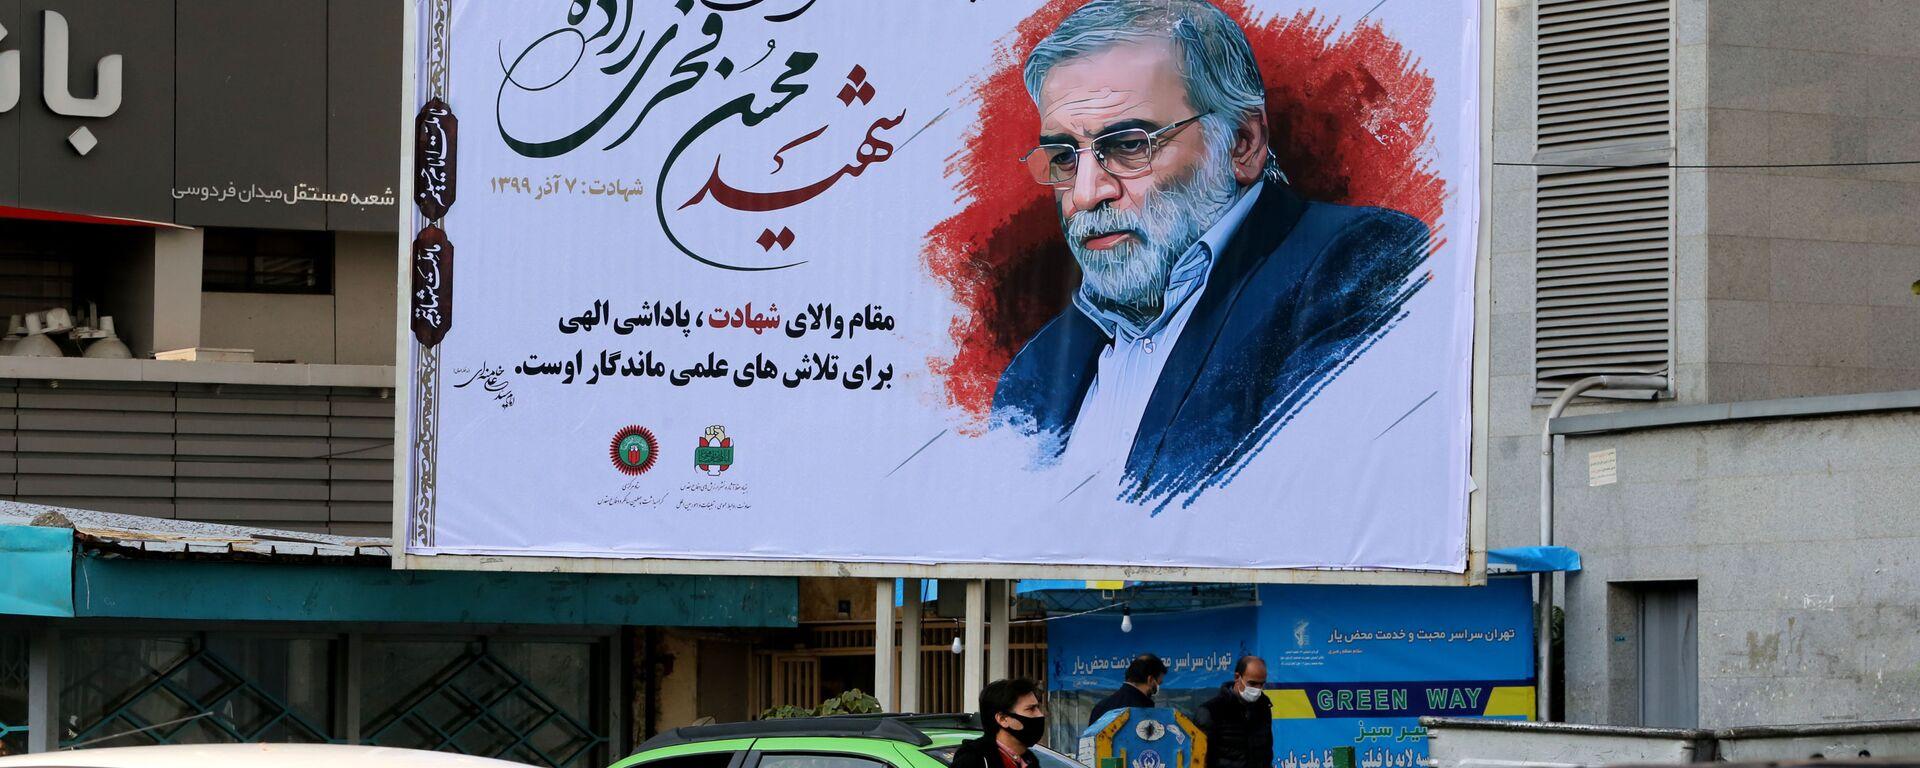 Автомобили проезжают мимо плаката с изображением ученого-ядерщика Мохсена Фахризаде в Тегеране, Иран - Sputnik Узбекистан, 1920, 02.12.2020